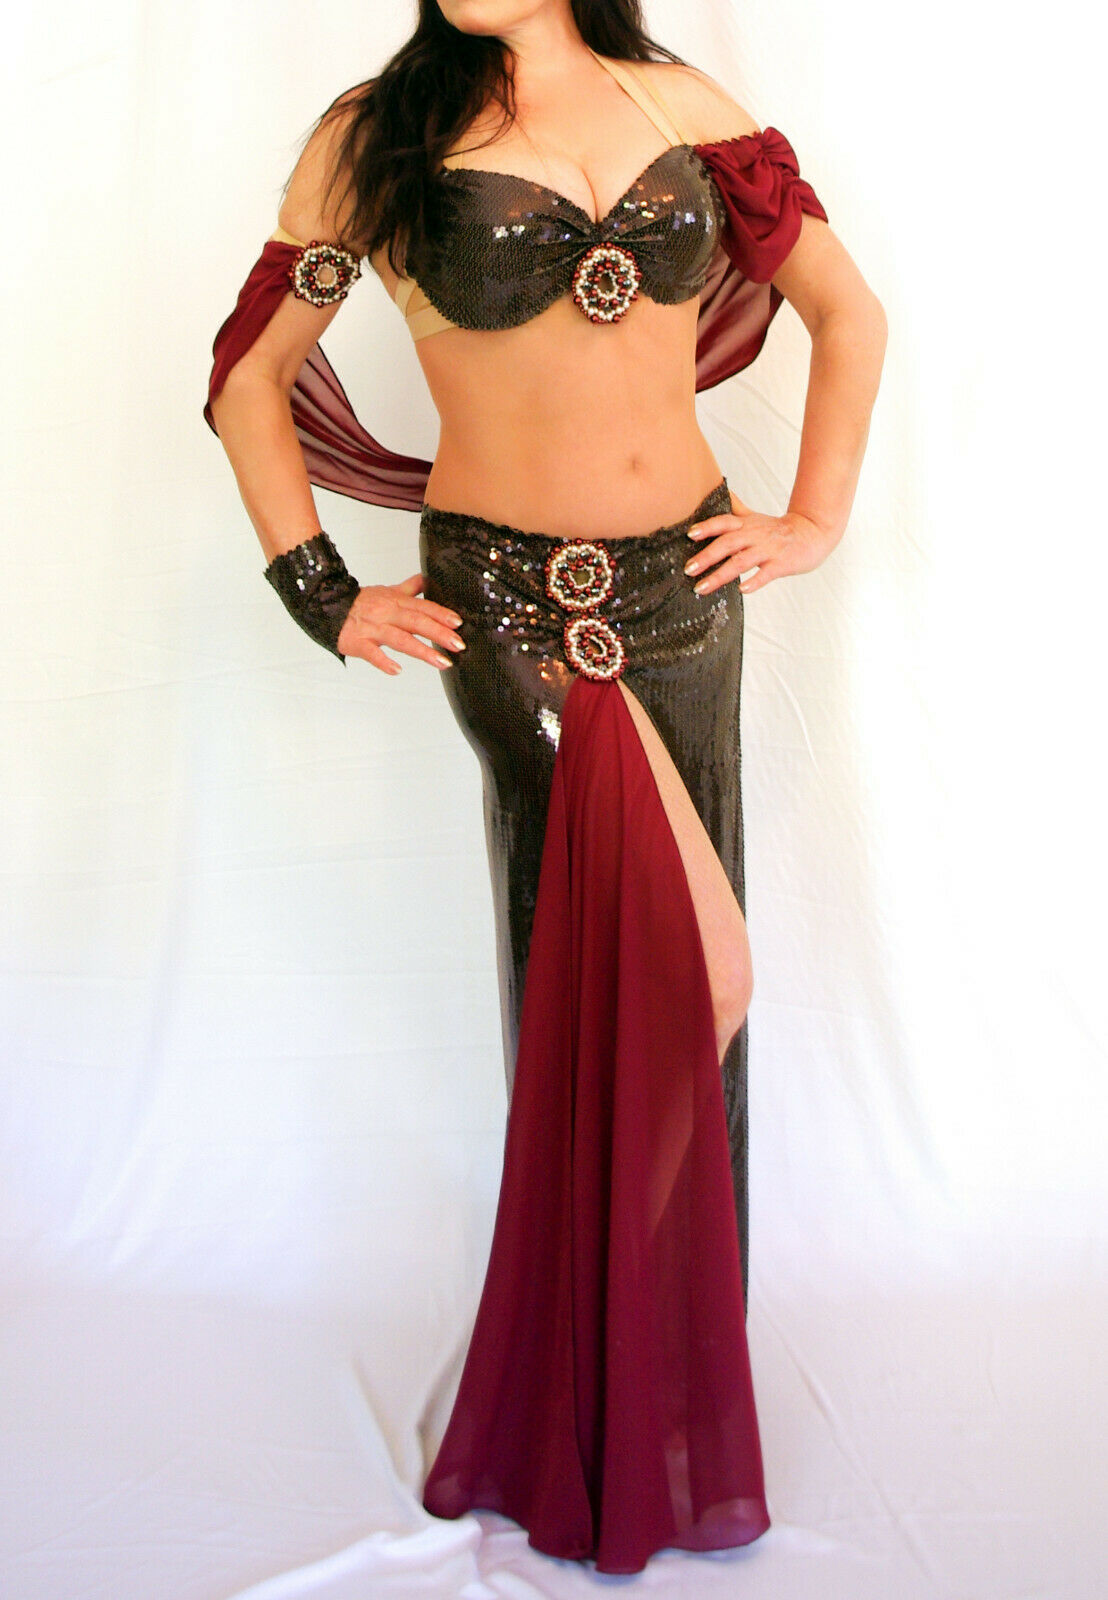 Professional Belly Dance Costume Designer Belly Dance Costume Unique Sequin Fabric Größe 36-38